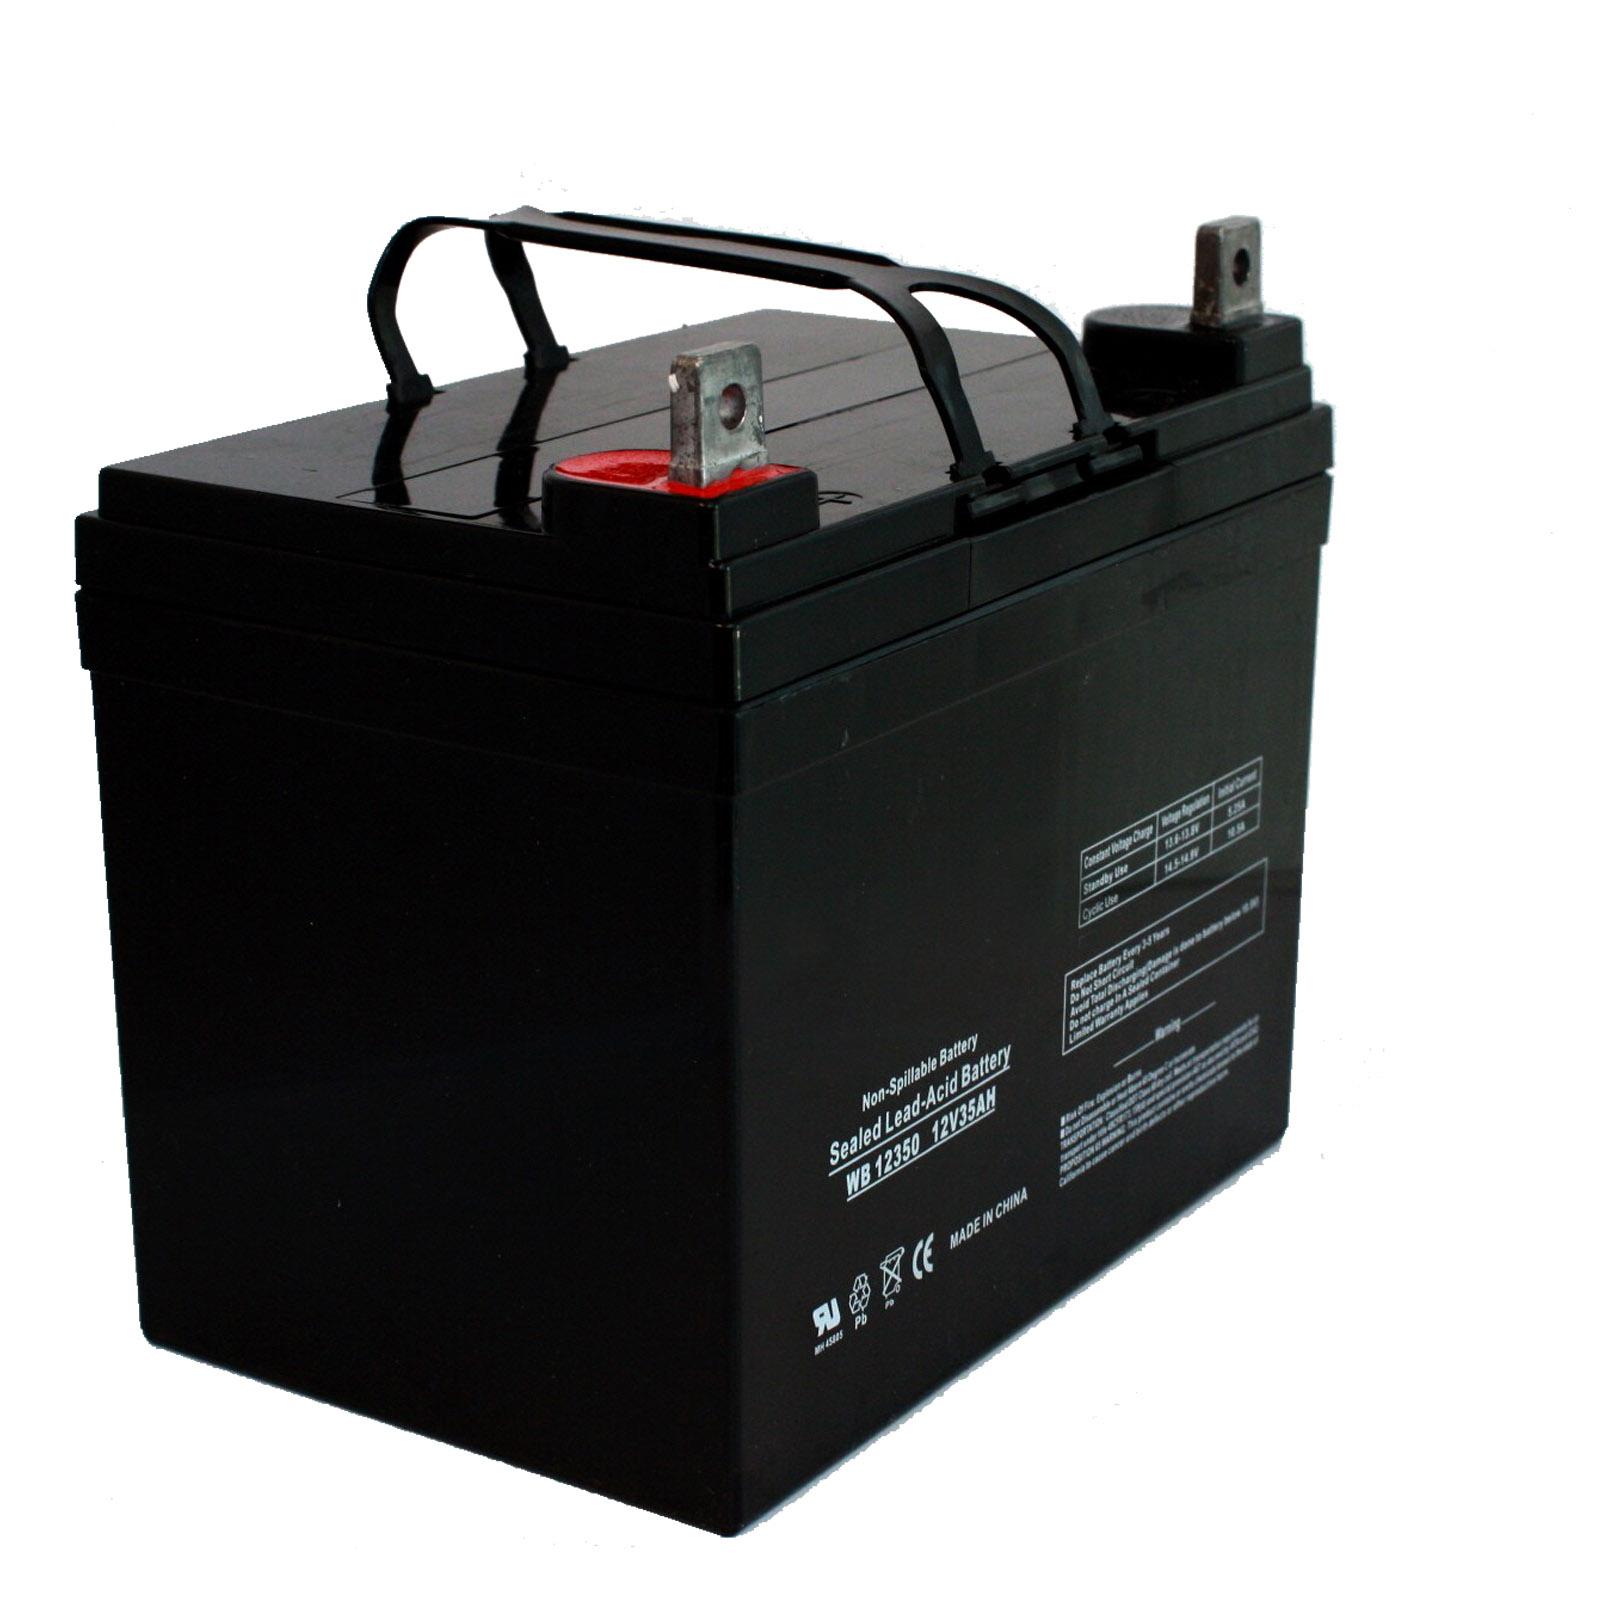 wheel chair batteries design within reach new 2pc 12v 35ah u1 sla agm wheelchair golf cart med